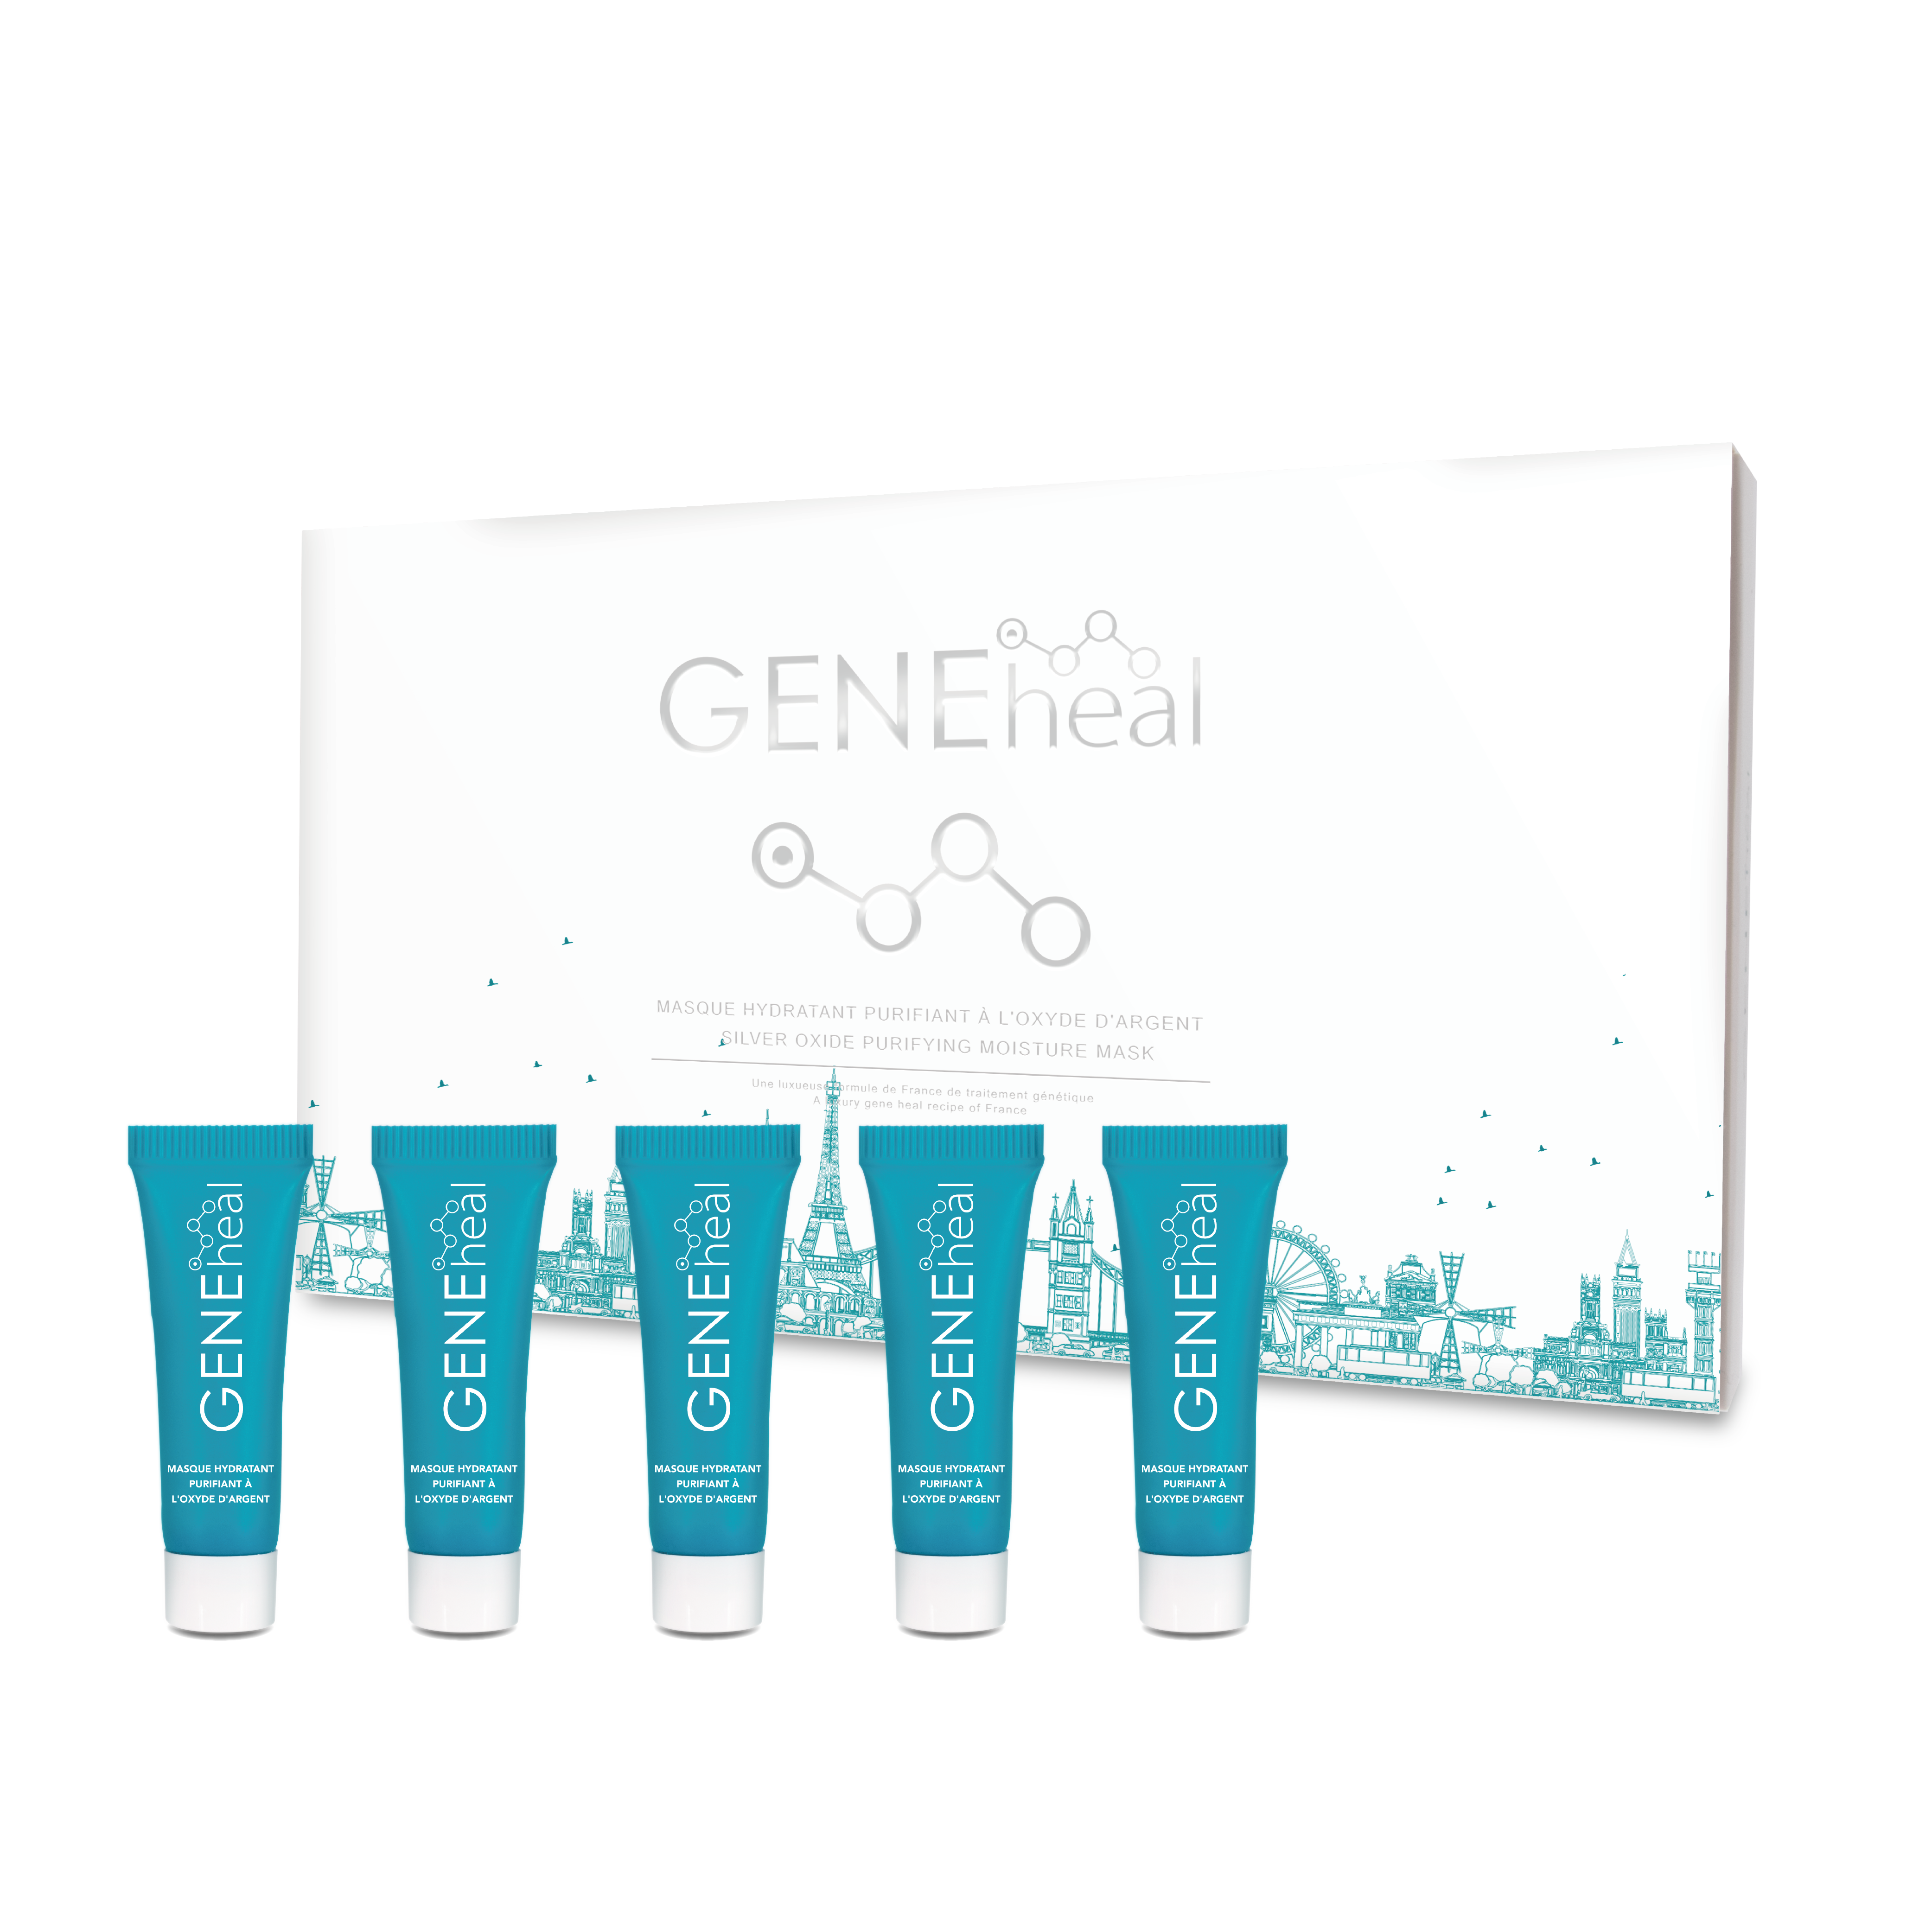 GENEliftox 100 - 氧化銀淨顏面膜(旅行裝) GH-G-19-060